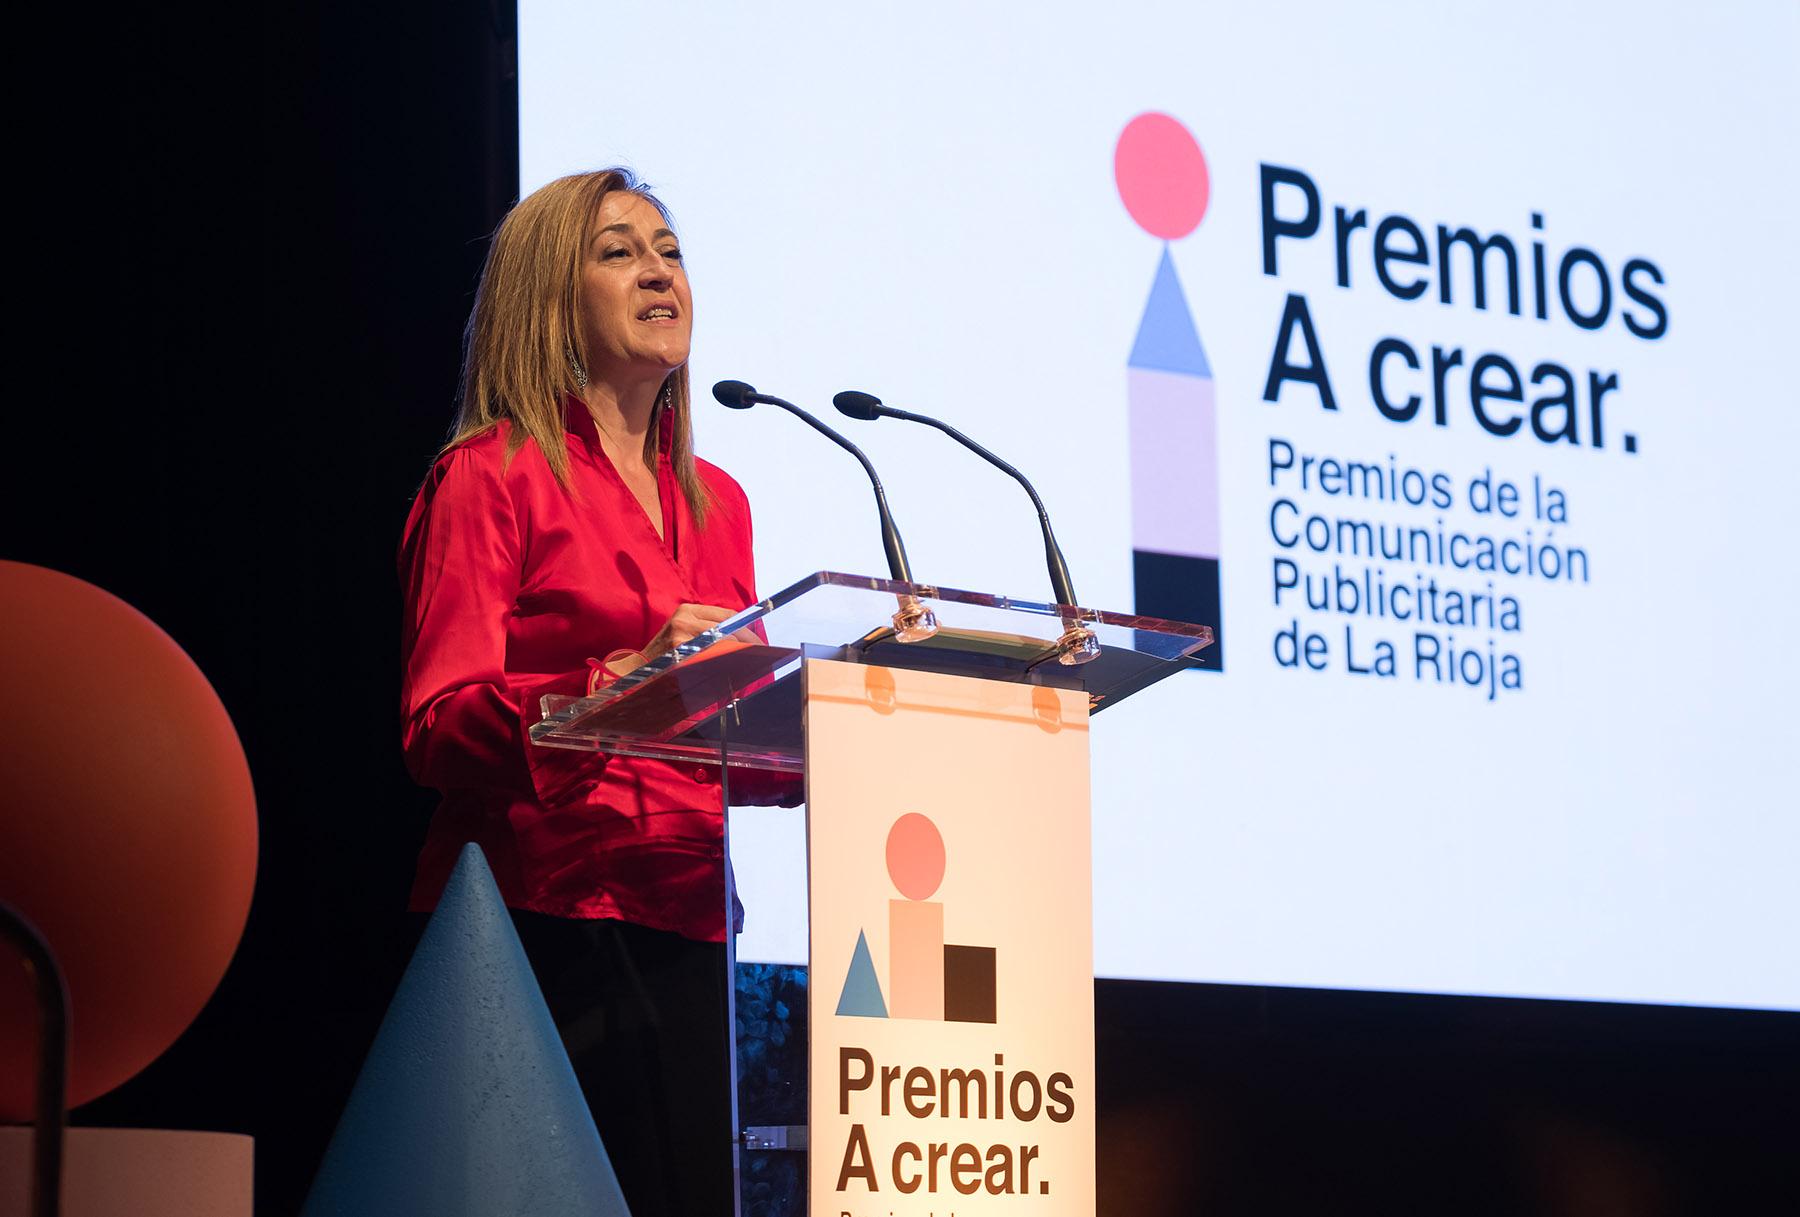 PREMIOSA-CREAR-FD-6512